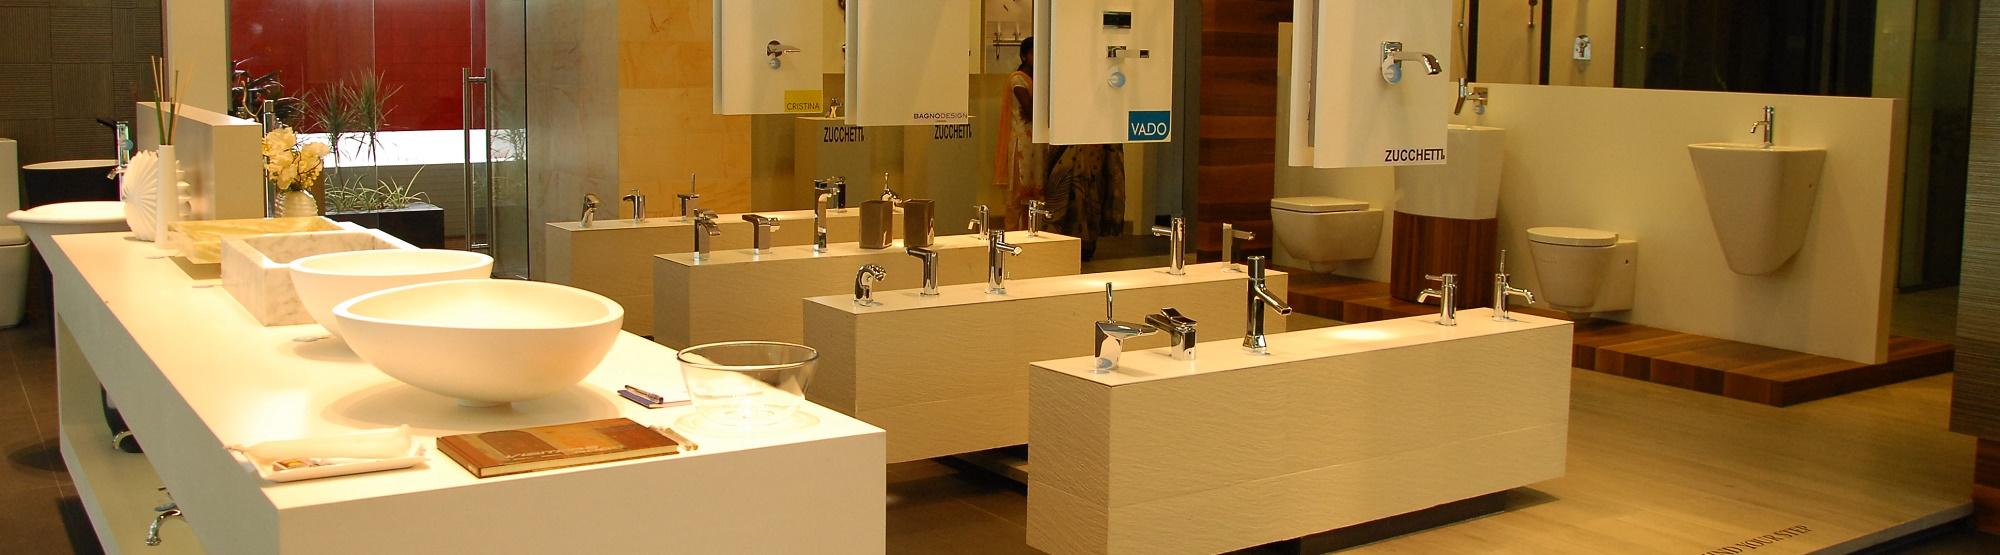 Bathroom Designs Hyderabad bathroom designs showroom at jubilee hills, hyderabad